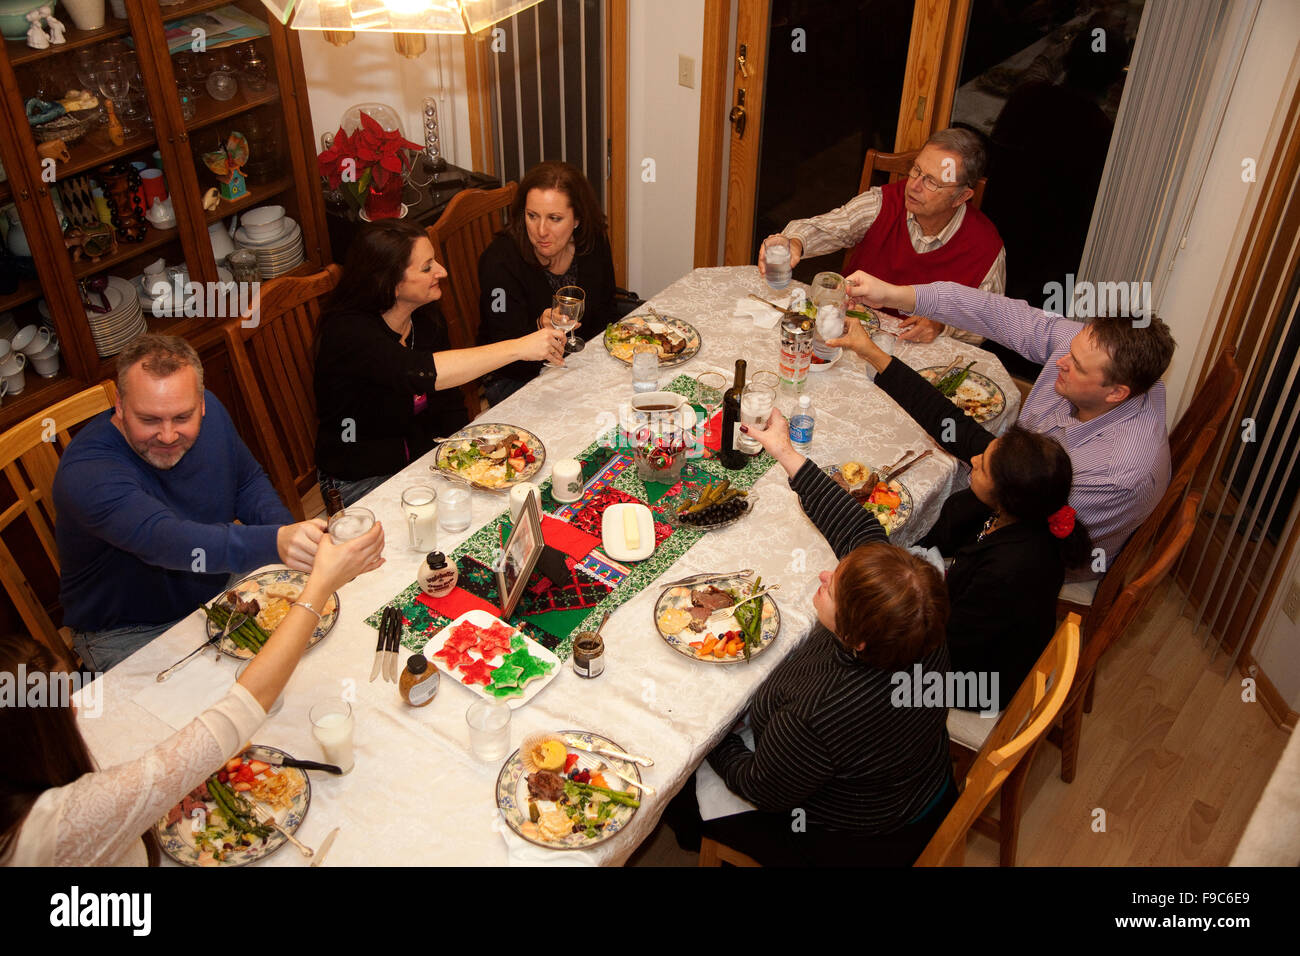 Tostado de la familia alrededor de la mesa del comedor. Mahtomedi MN Minnesota EE.UU. Imagen De Stock